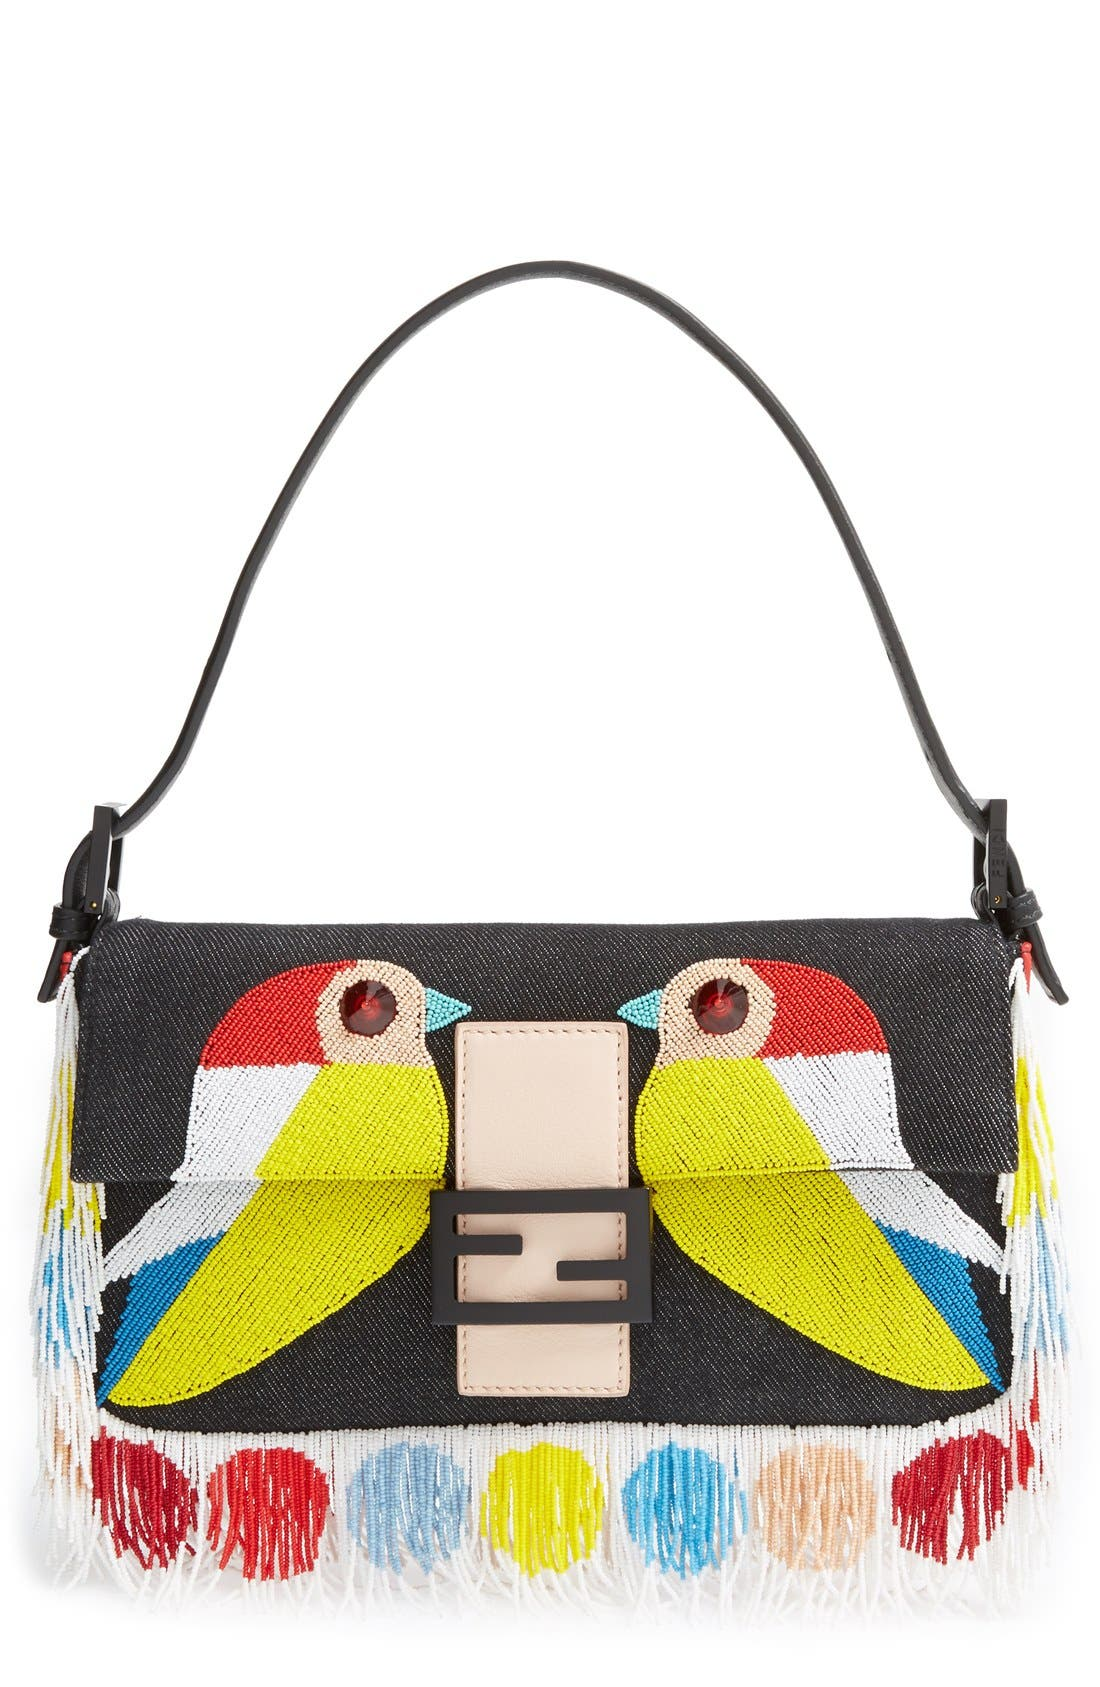 'Bird' Beaded Baguette,                         Main,                         color, Black/ Multi